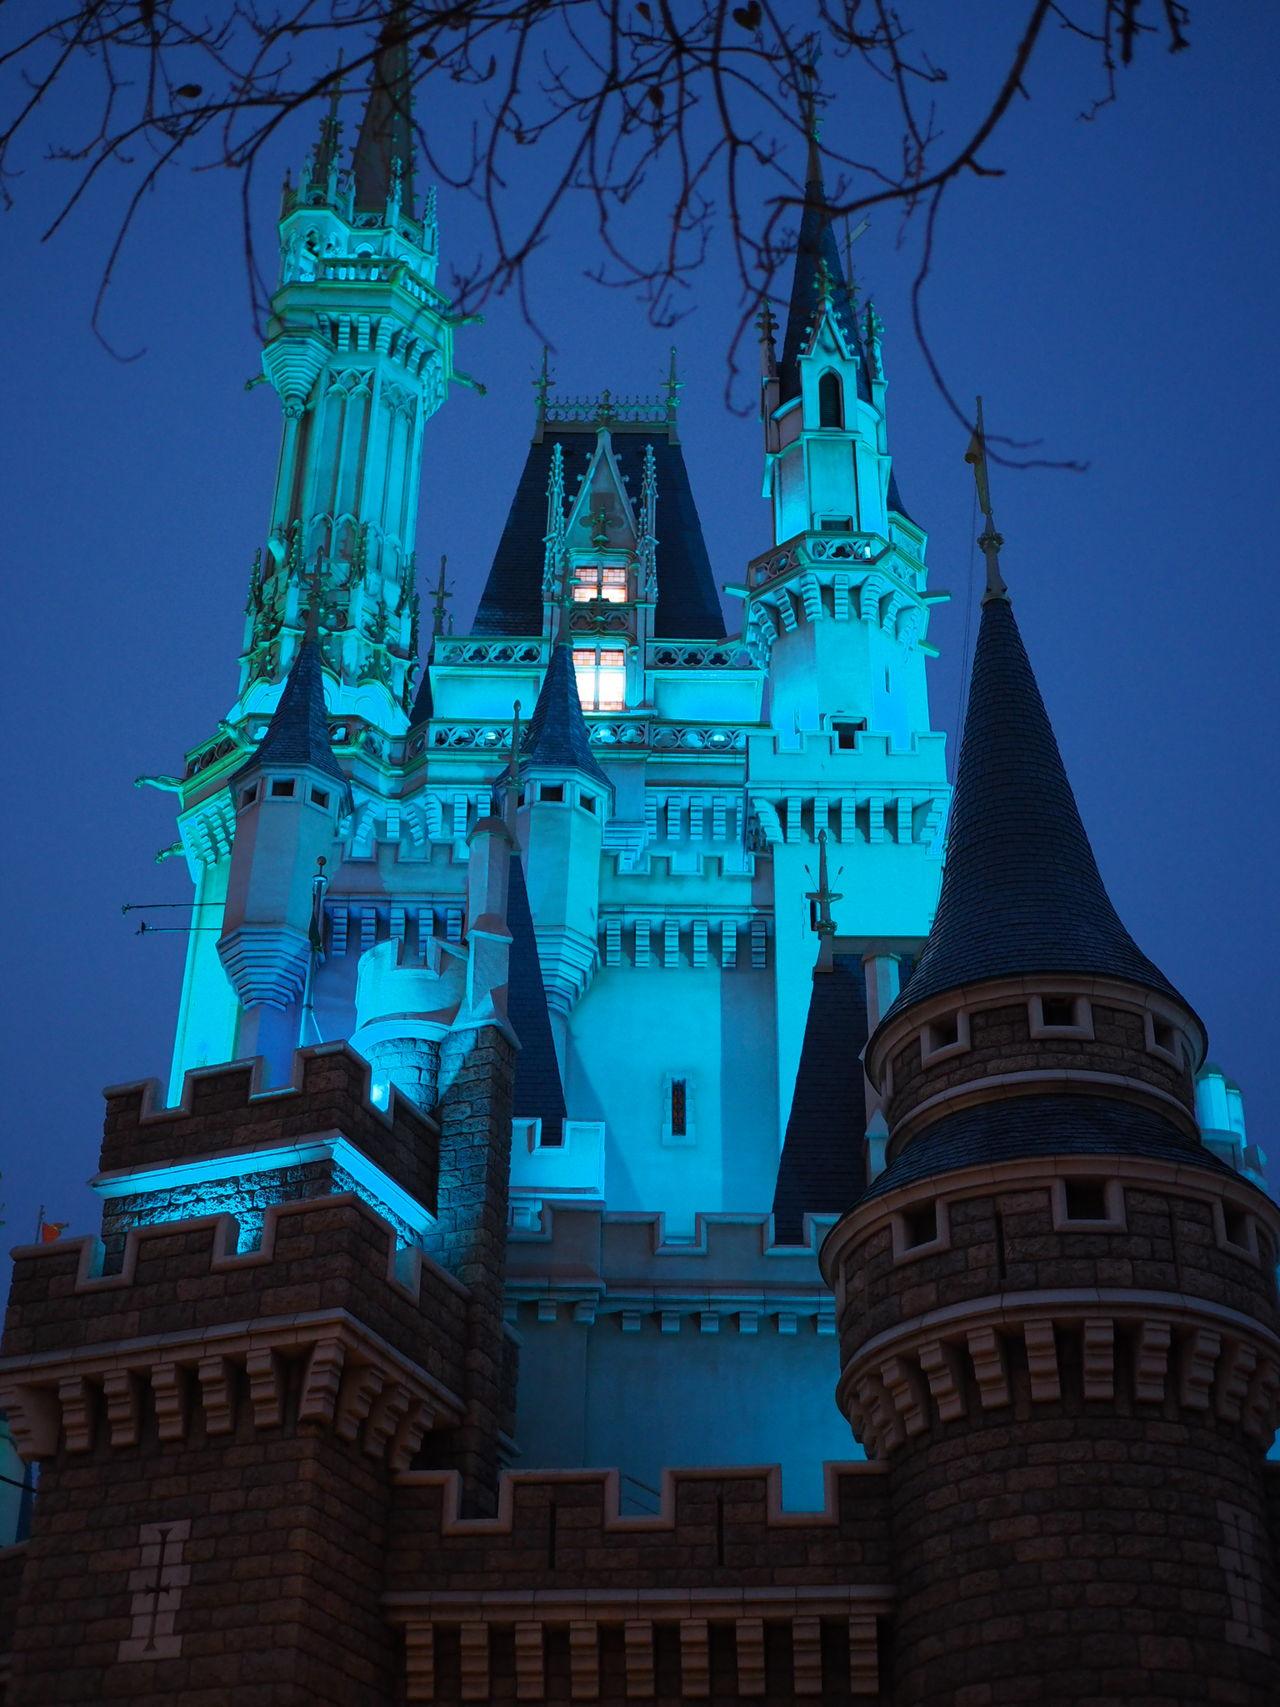 Architecture Travel Destinations Palace Disneyland Cinderella Tokyo Japan Light Night